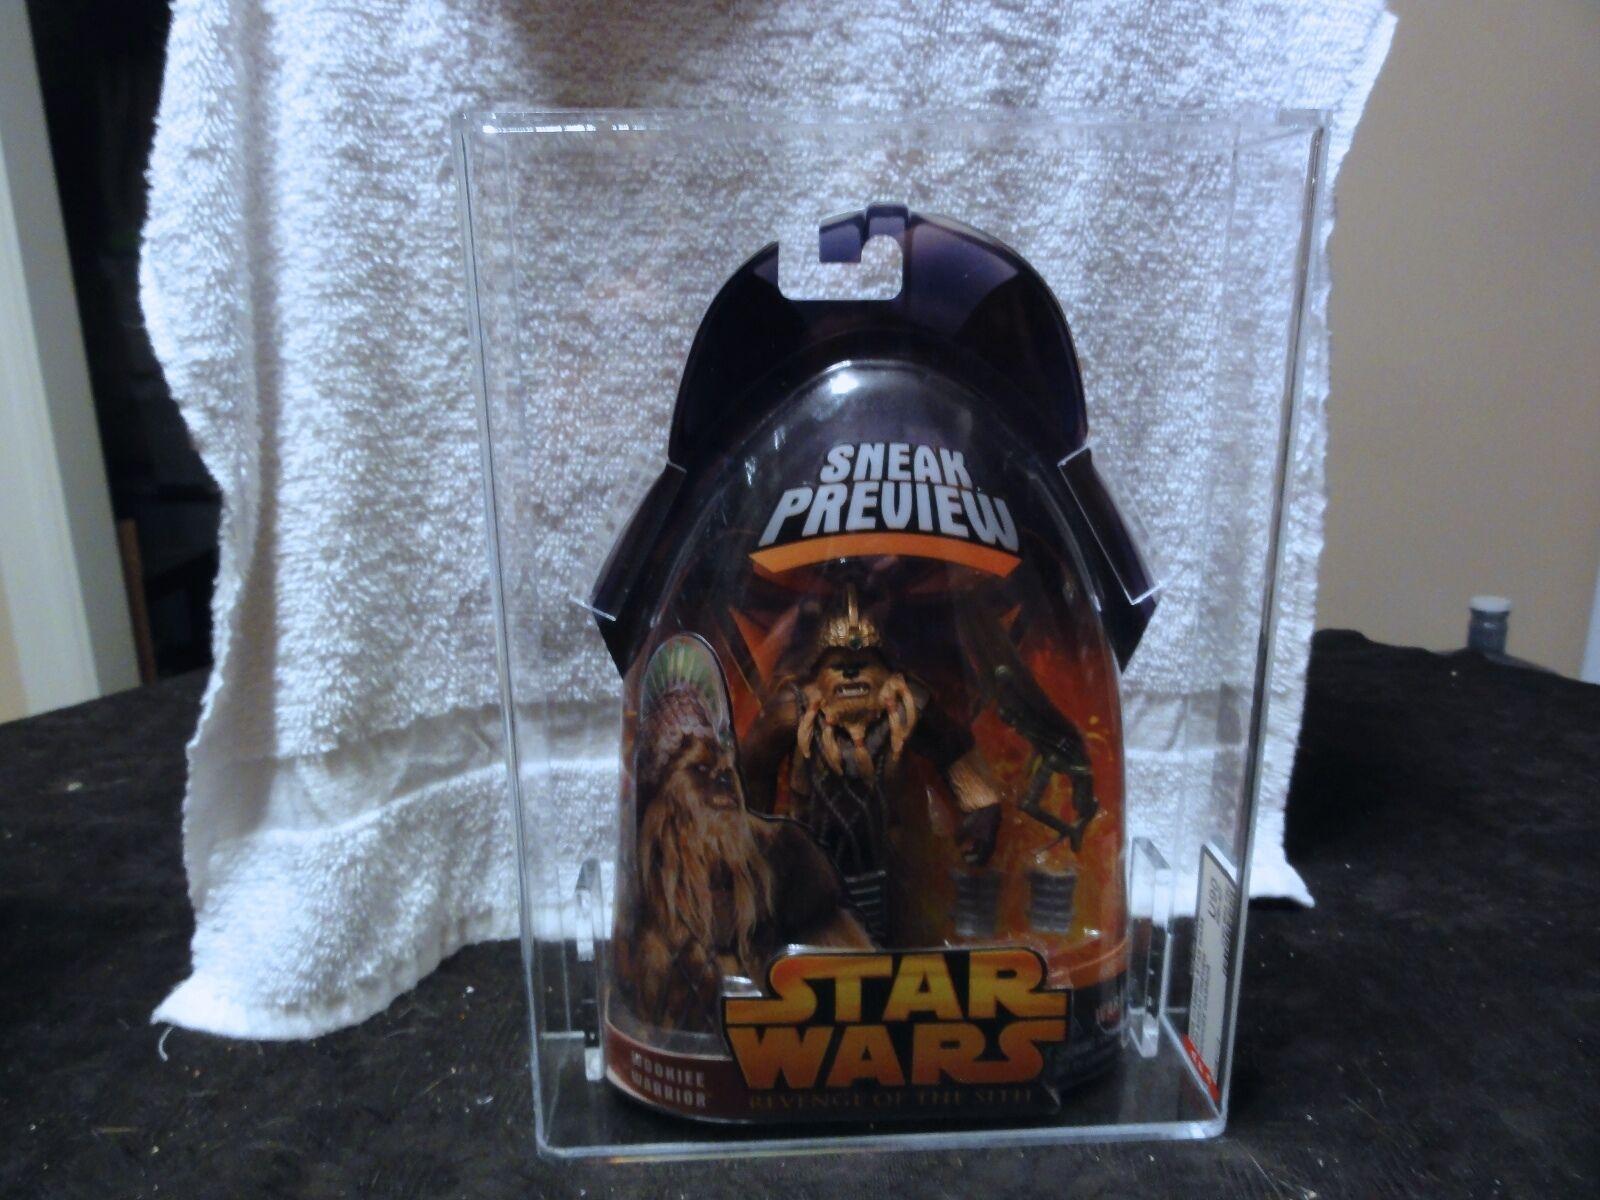 Star - wars - 2005 ep3 verrottet wookiee krieger afa versiegelt mib - box